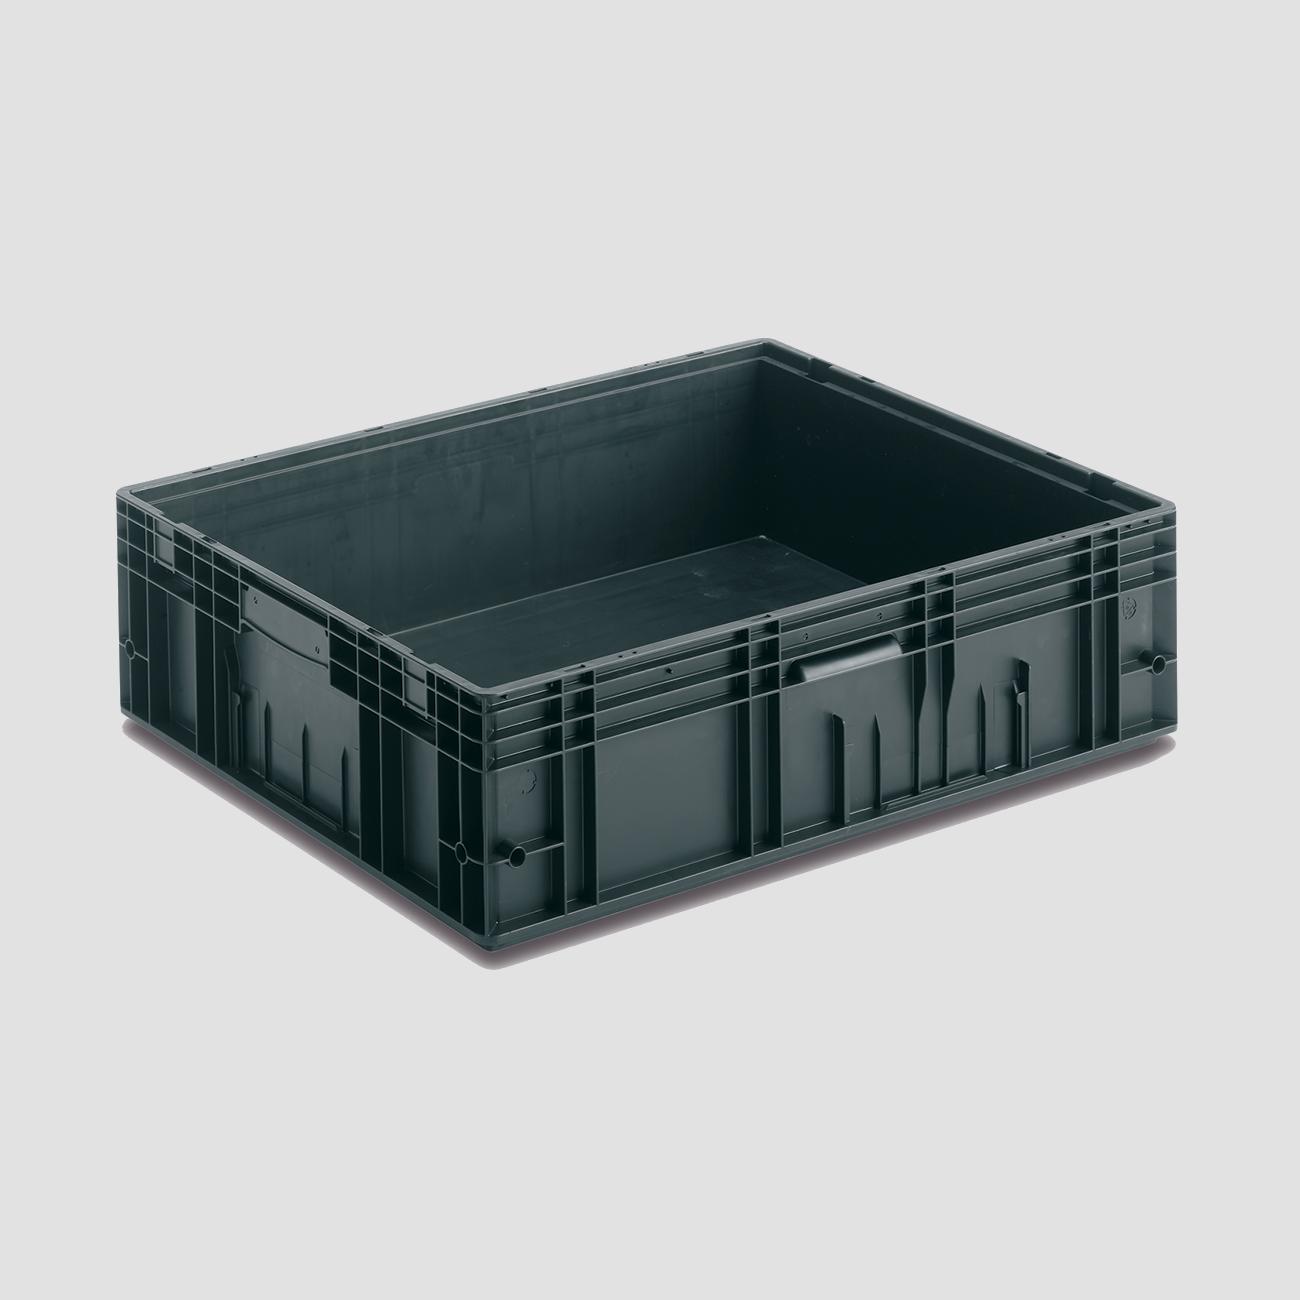 Solid Plastic Container VDA-RL-KLT 8612